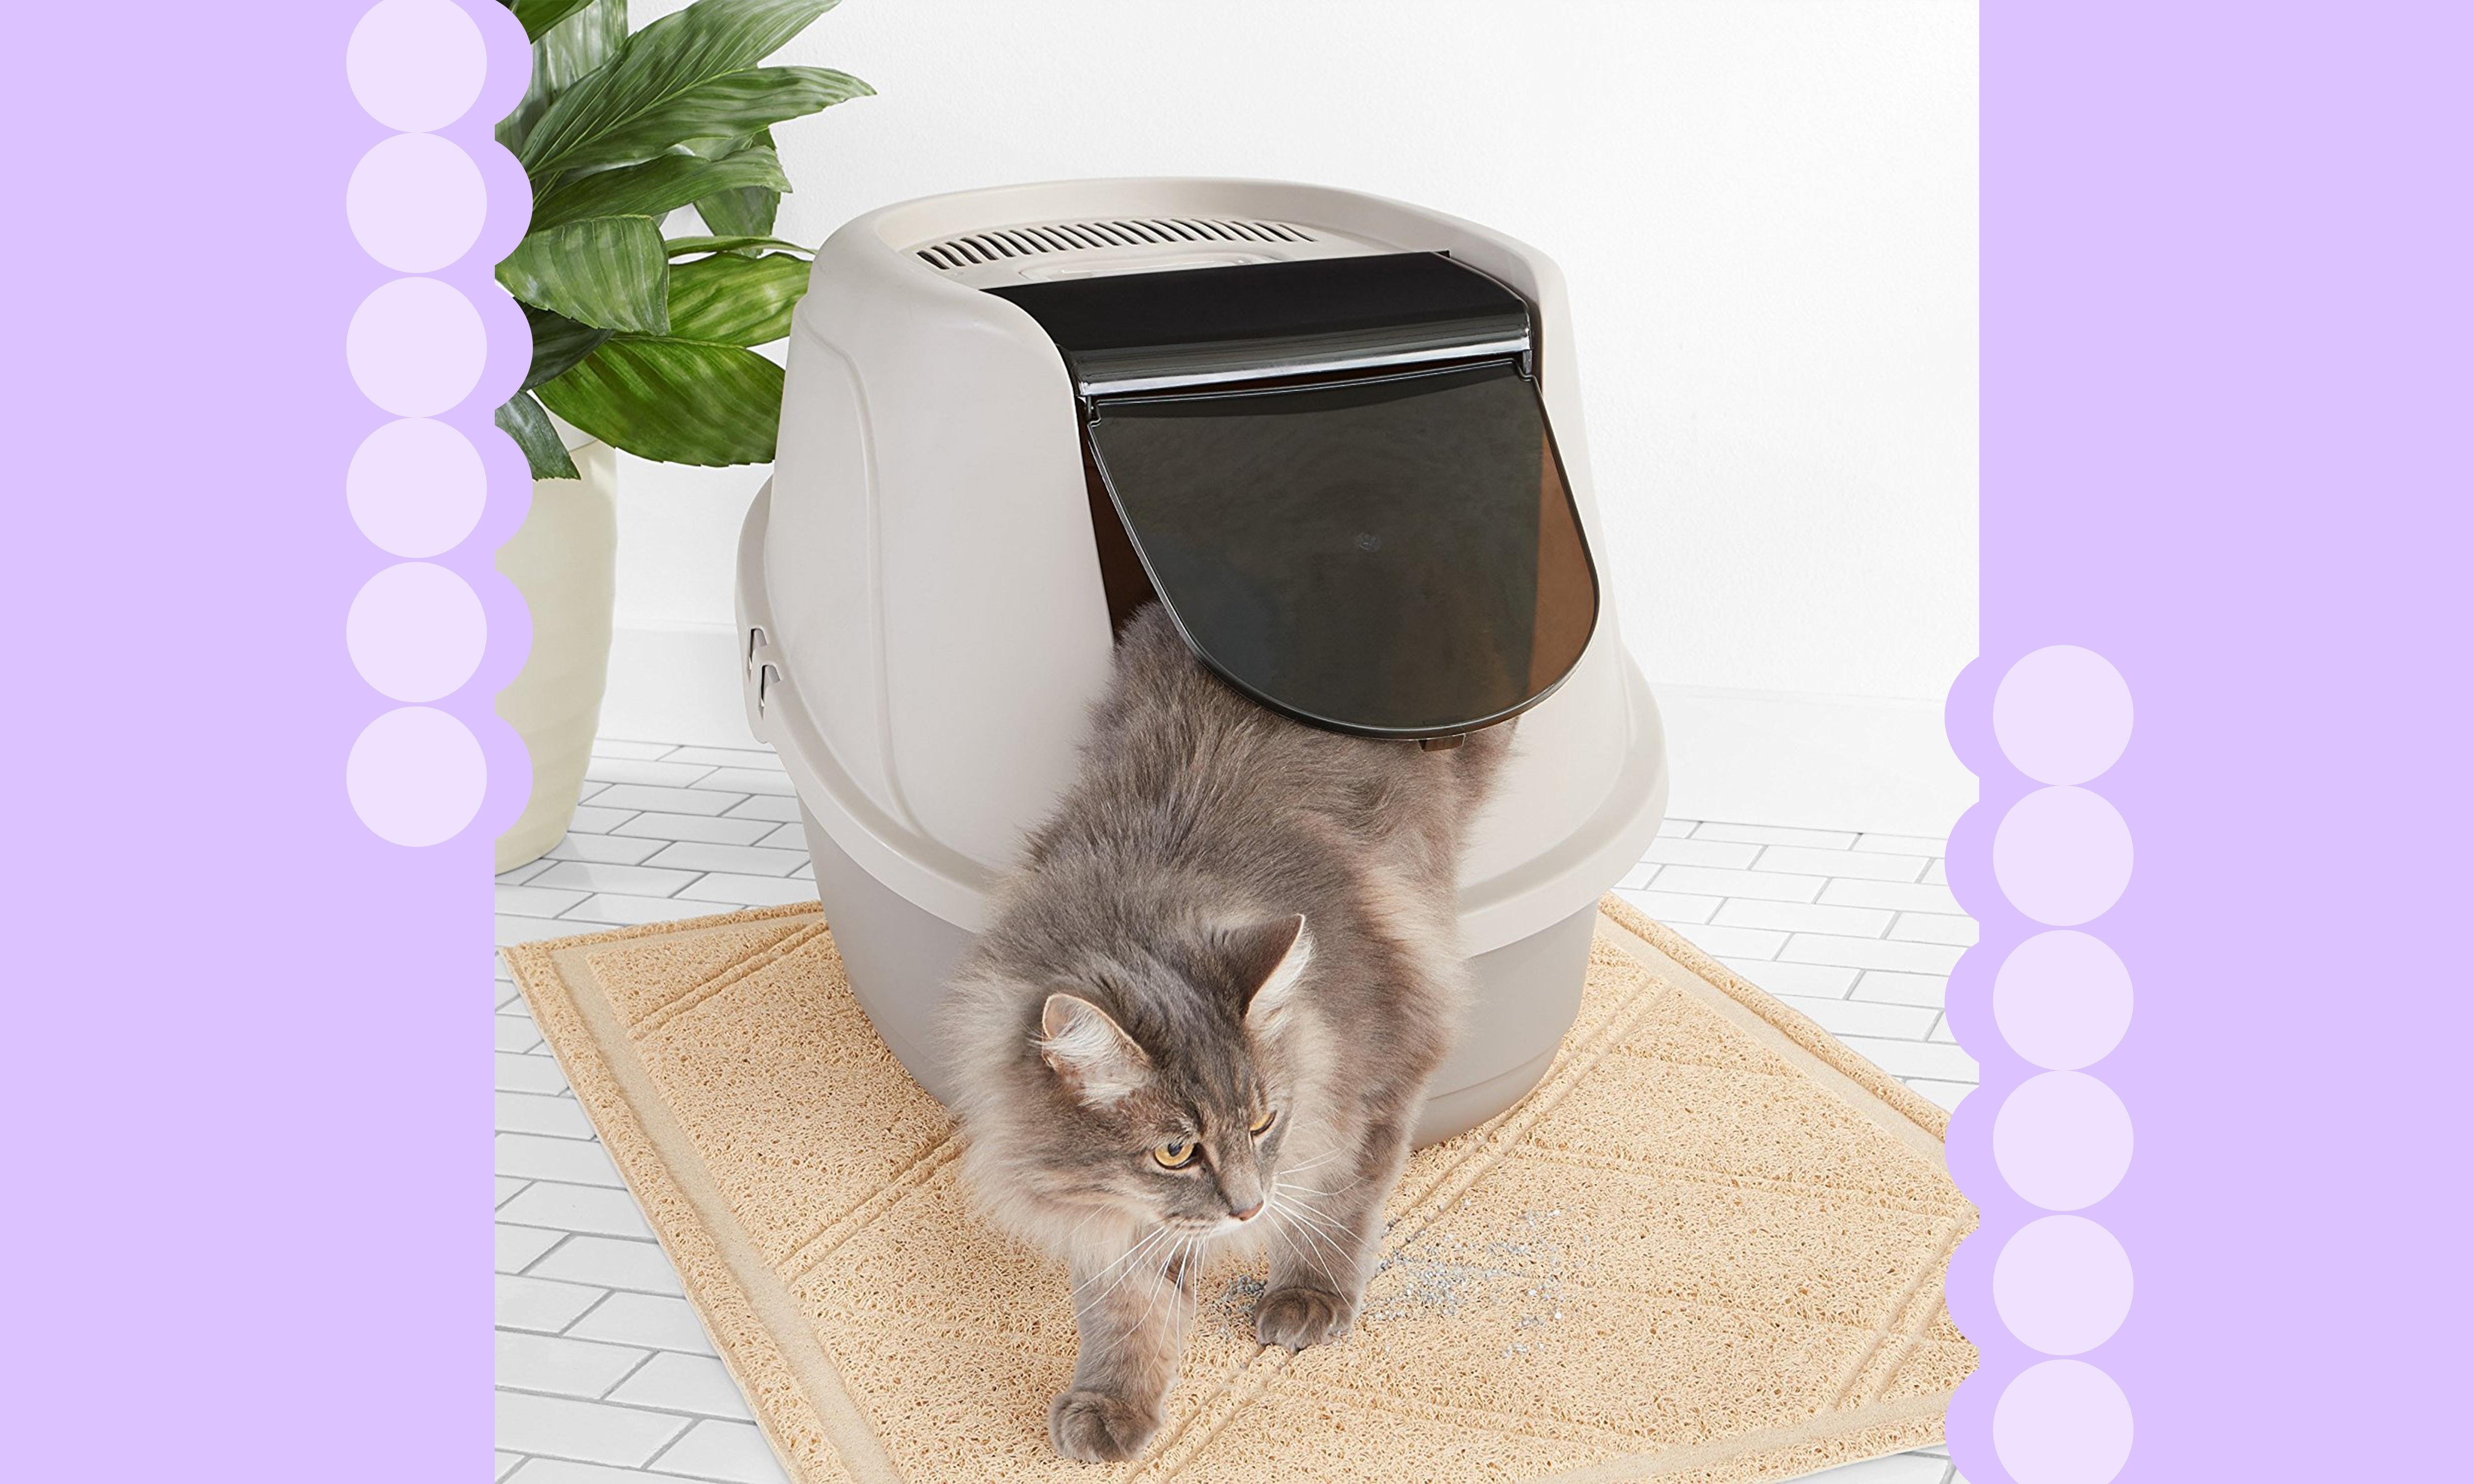 cat pcr rated size in mats amazon catches mesh customer mat litter com xl best reviews helpful